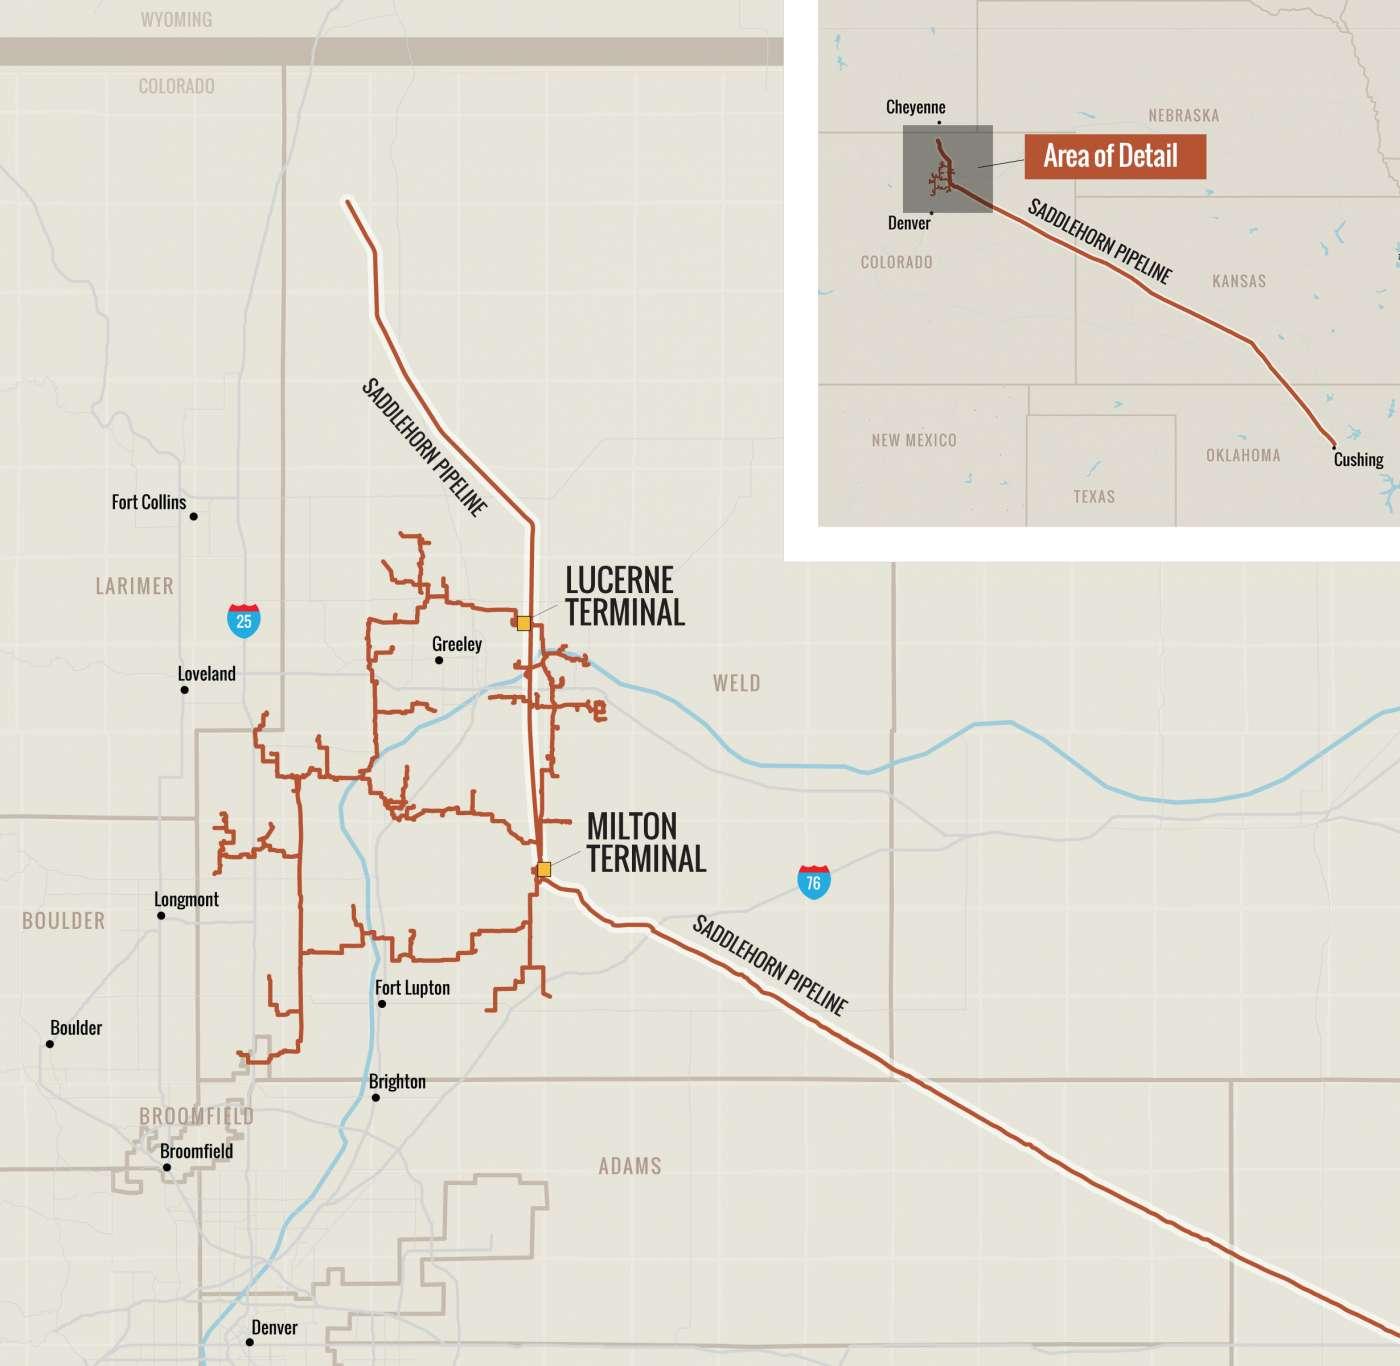 Map of Black Diamond Gathering System and Saddlehorn Pipeline